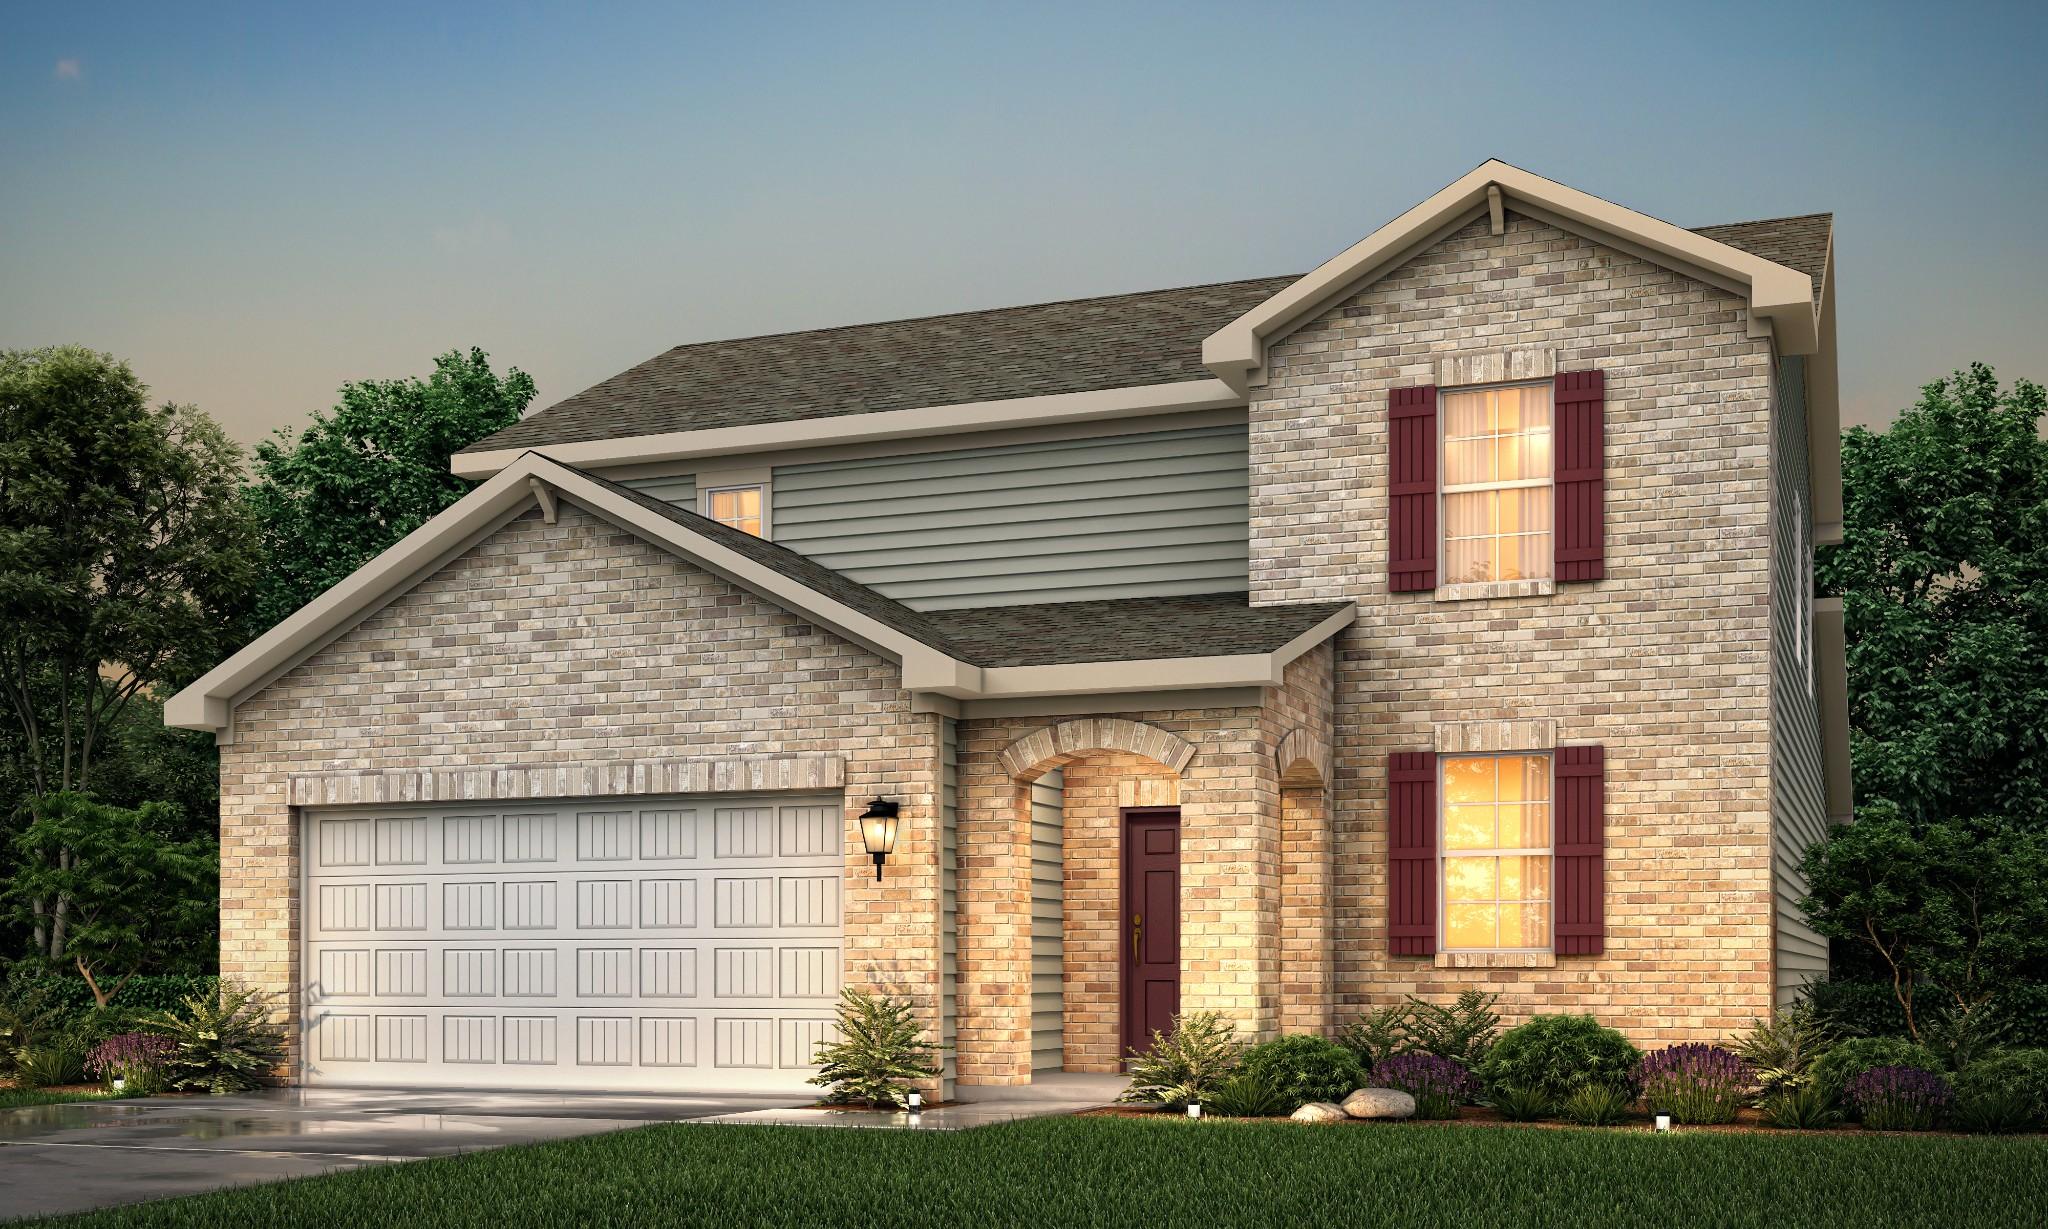 709 Lantana Drive Lot 169, Smyrna, TN 37167 - Smyrna, TN real estate listing